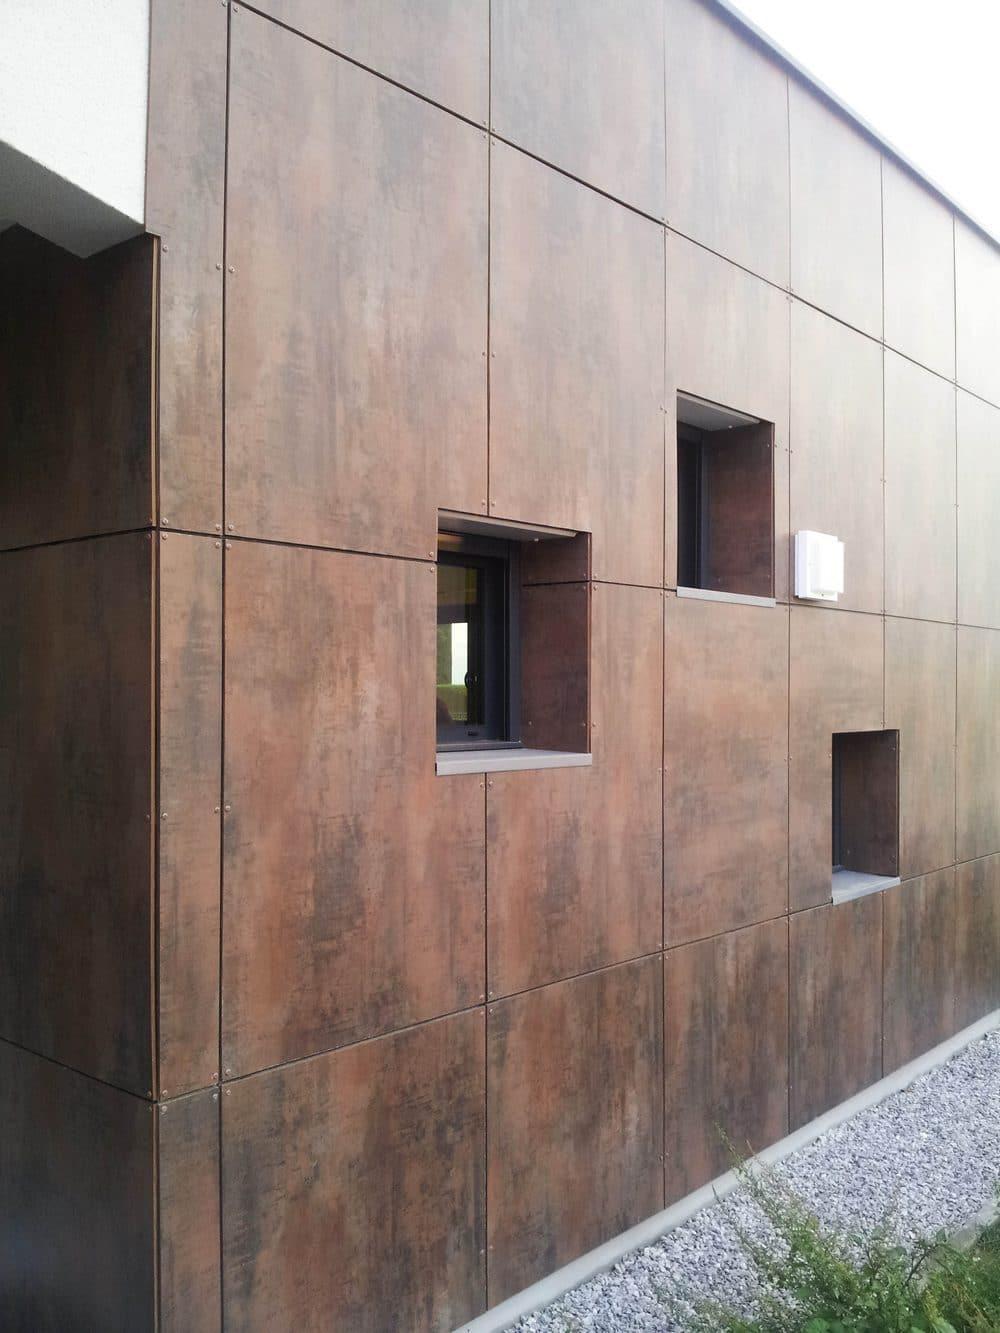 Architecte cabinet dentaire - Cabinet branchereau immobilier angers ...